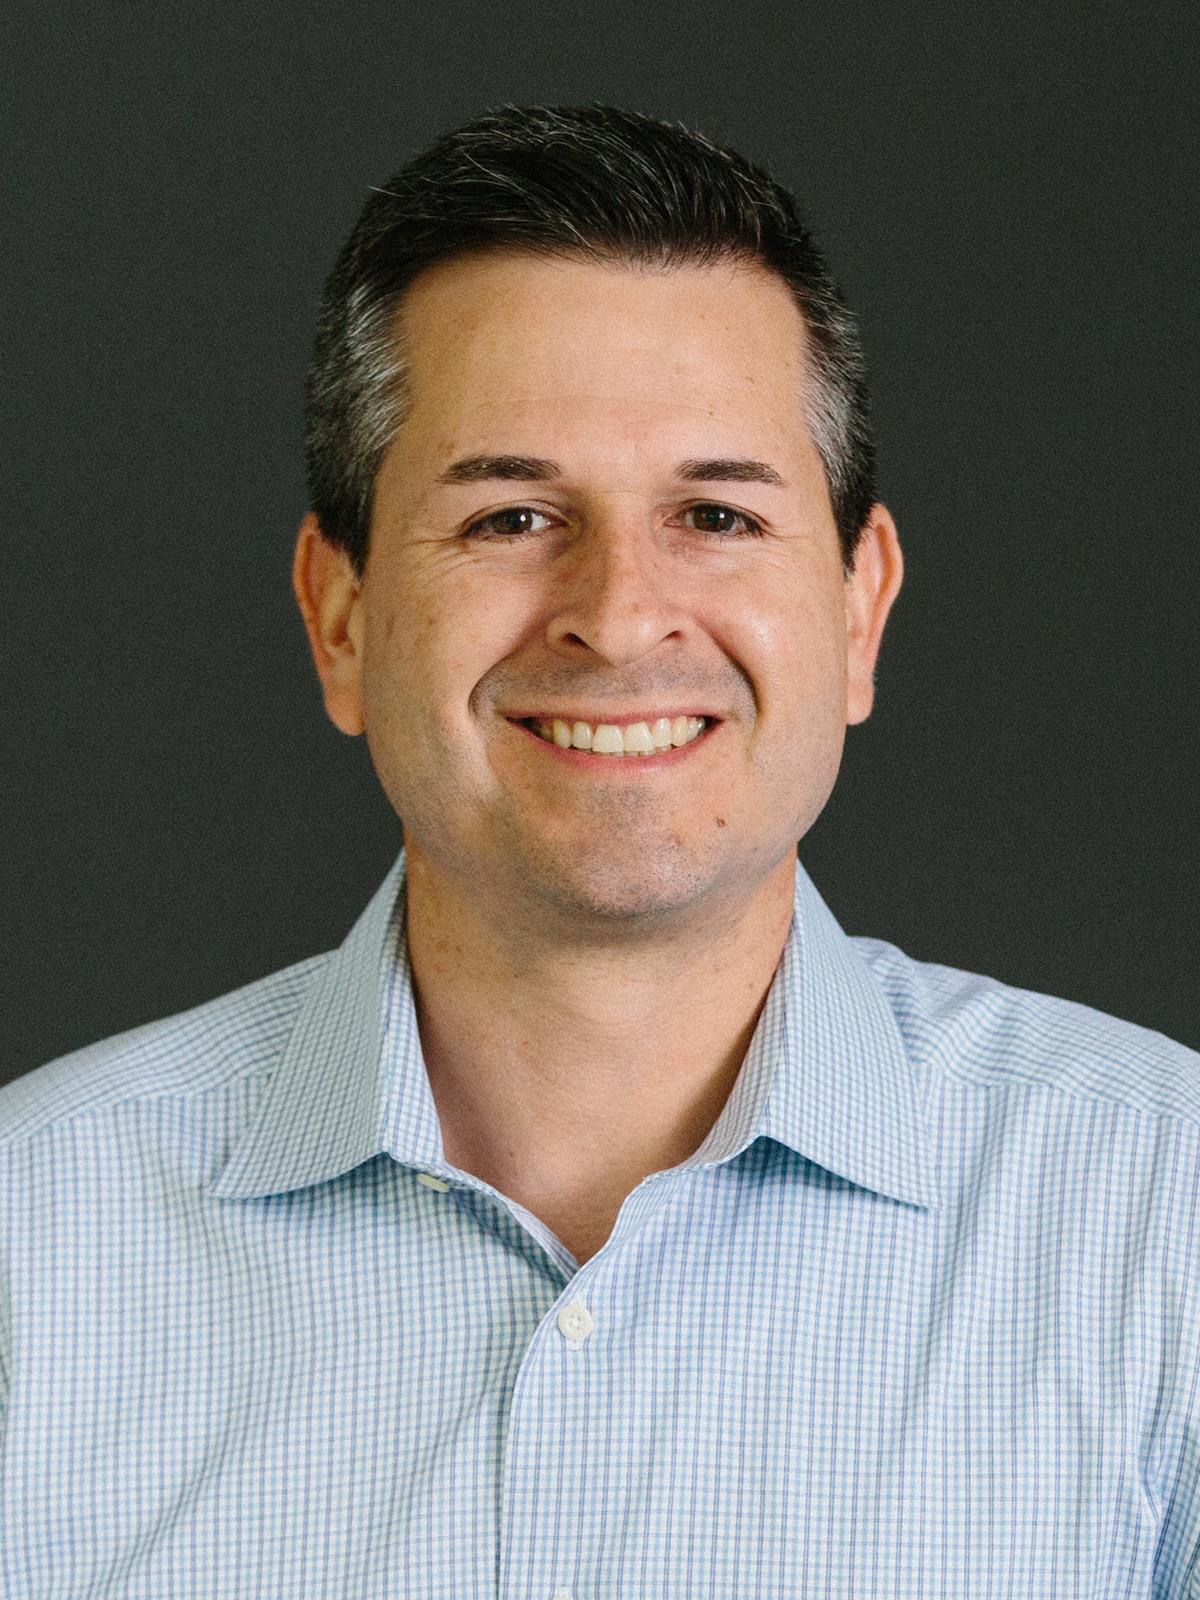 Robert Martinez portrait image